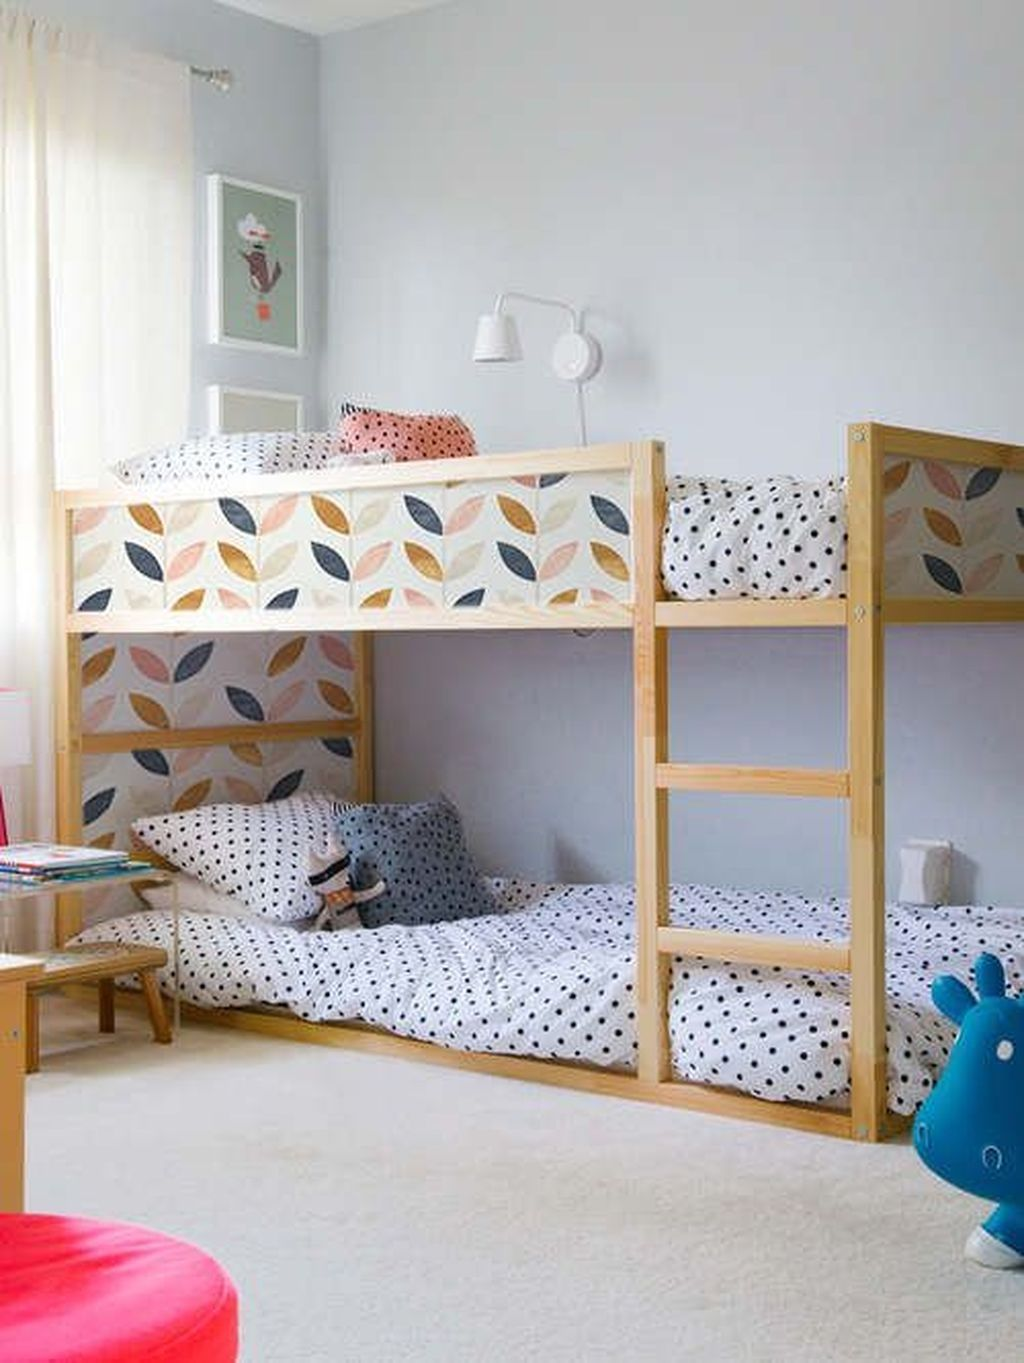 88 Cool Ikea Kura Beds Ideas For Your Kids Room Ikea Kura Bed